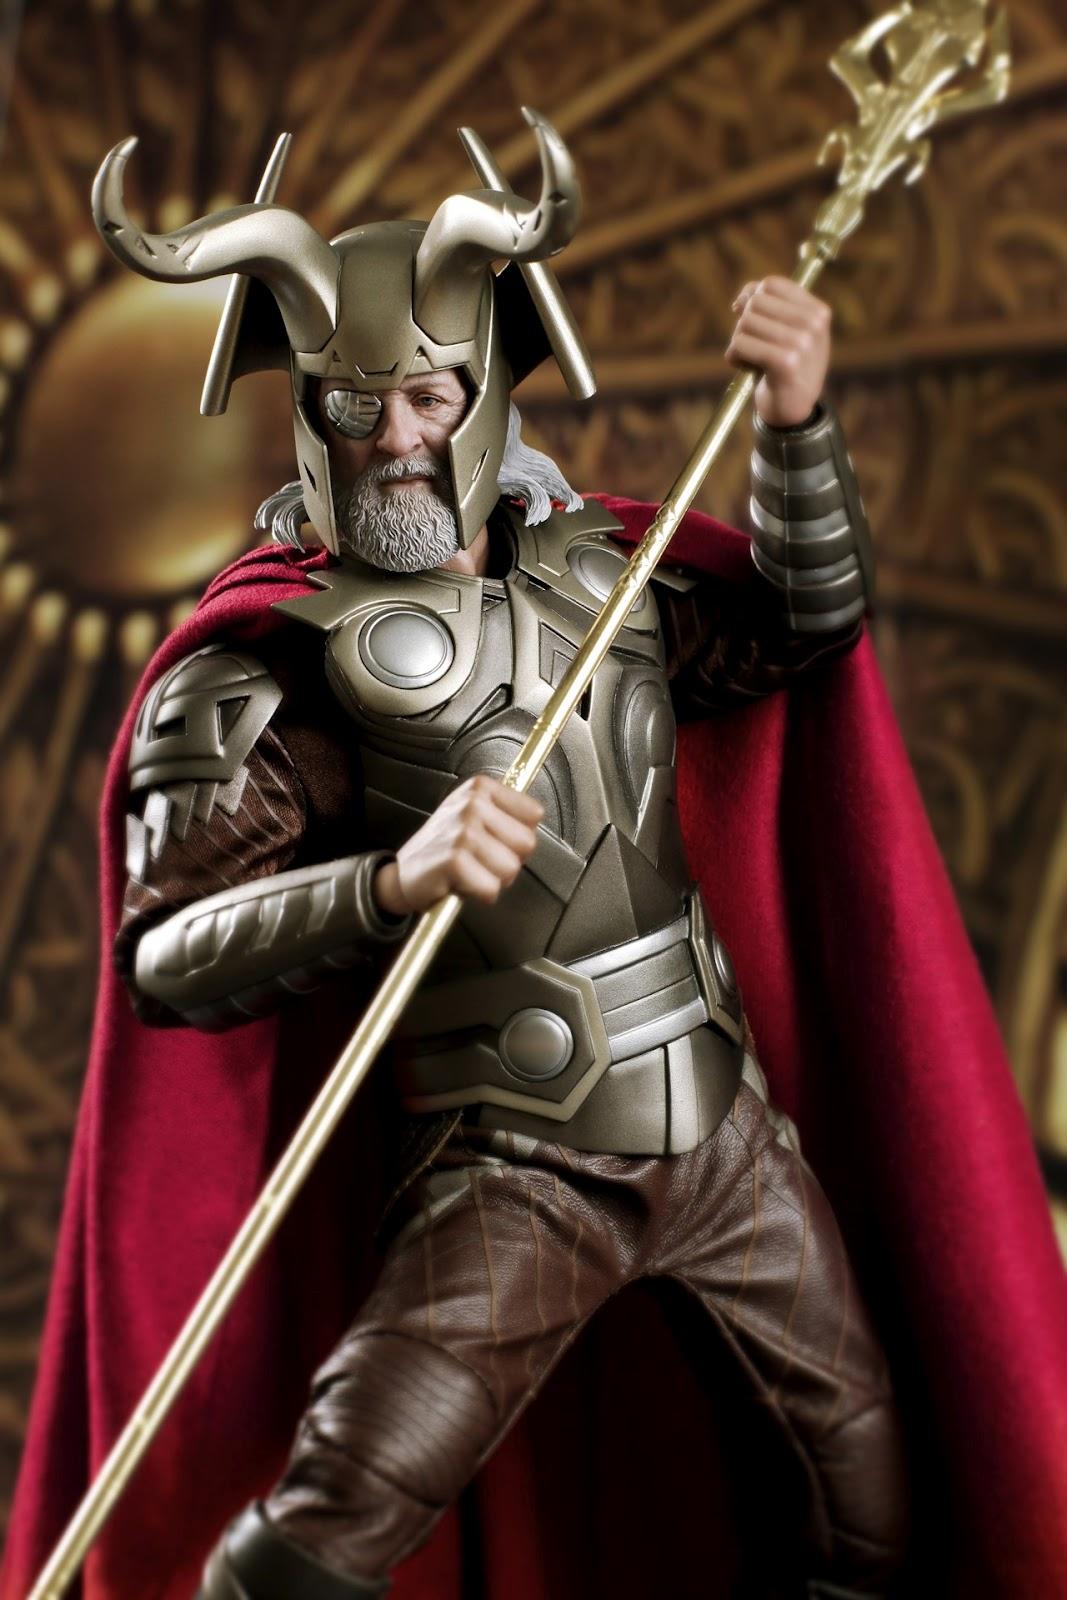 http://2.bp.blogspot.com/-cxXBruSNdqM/T4M2aoR6rjI/AAAAAAAADRM/-KFL6YKBM3o/s1600/28318_Odin+-+Thor+Movie+-+Hot+Toys_08.jpg